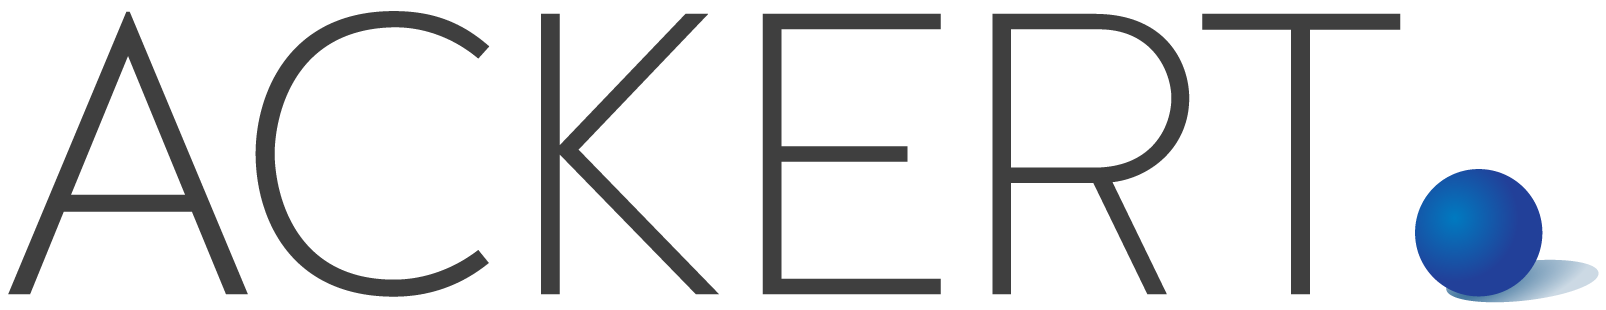 Ackert logo